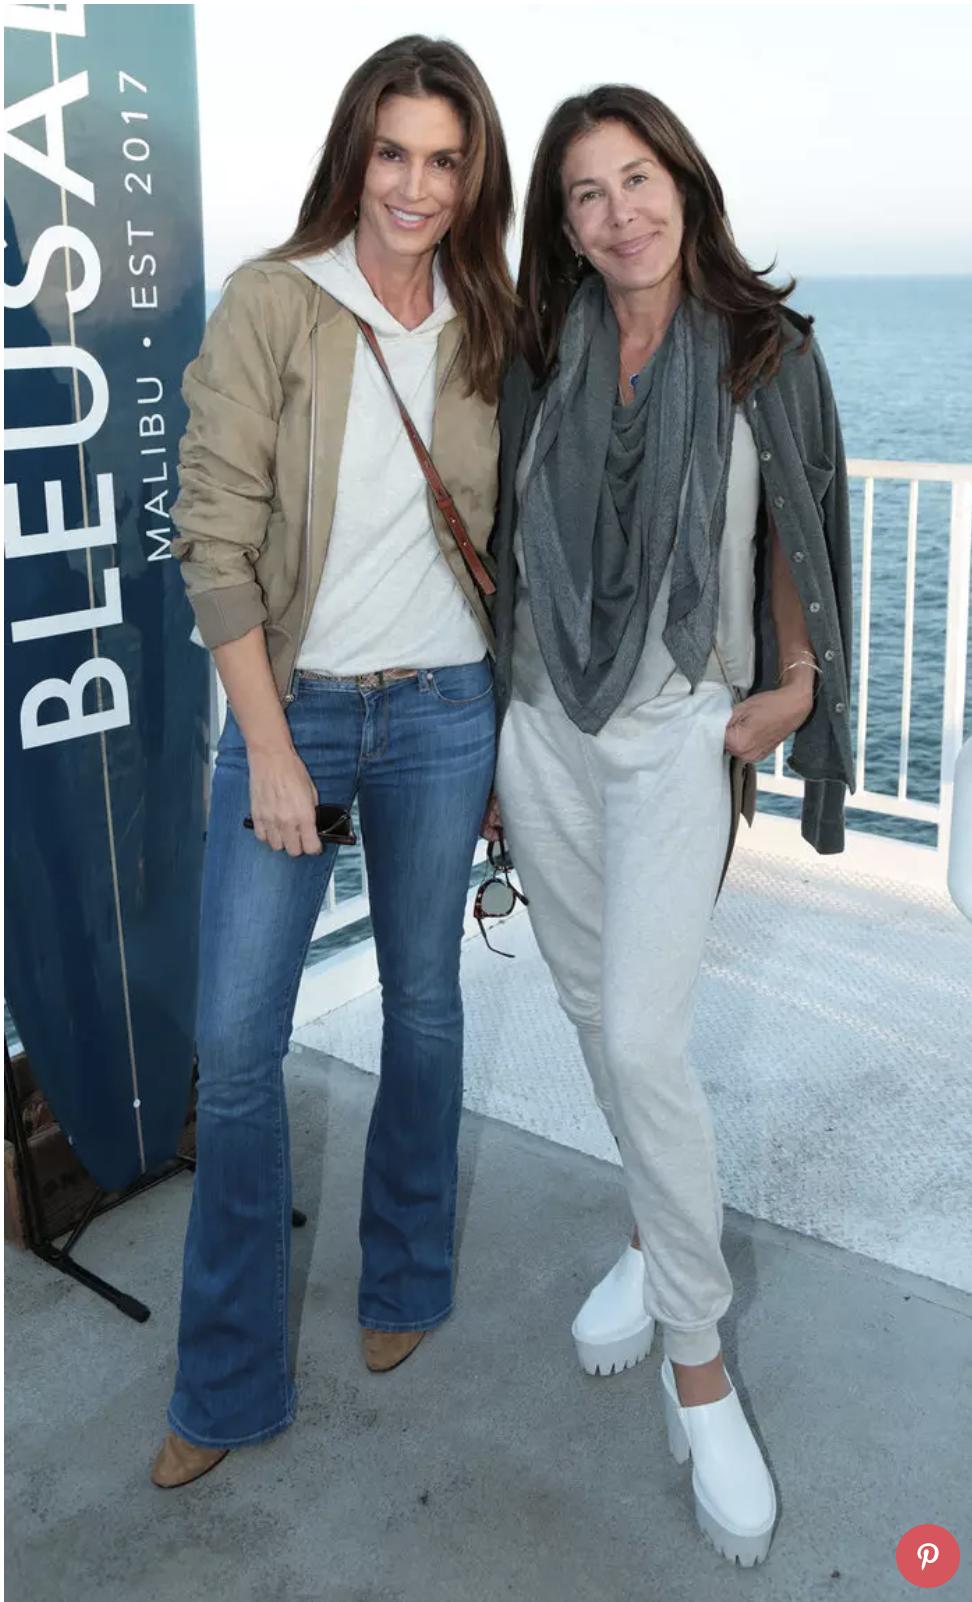 Lyndie Benson and Cindy Crawford. Photo credit:Alex J. Berliner, InStyle